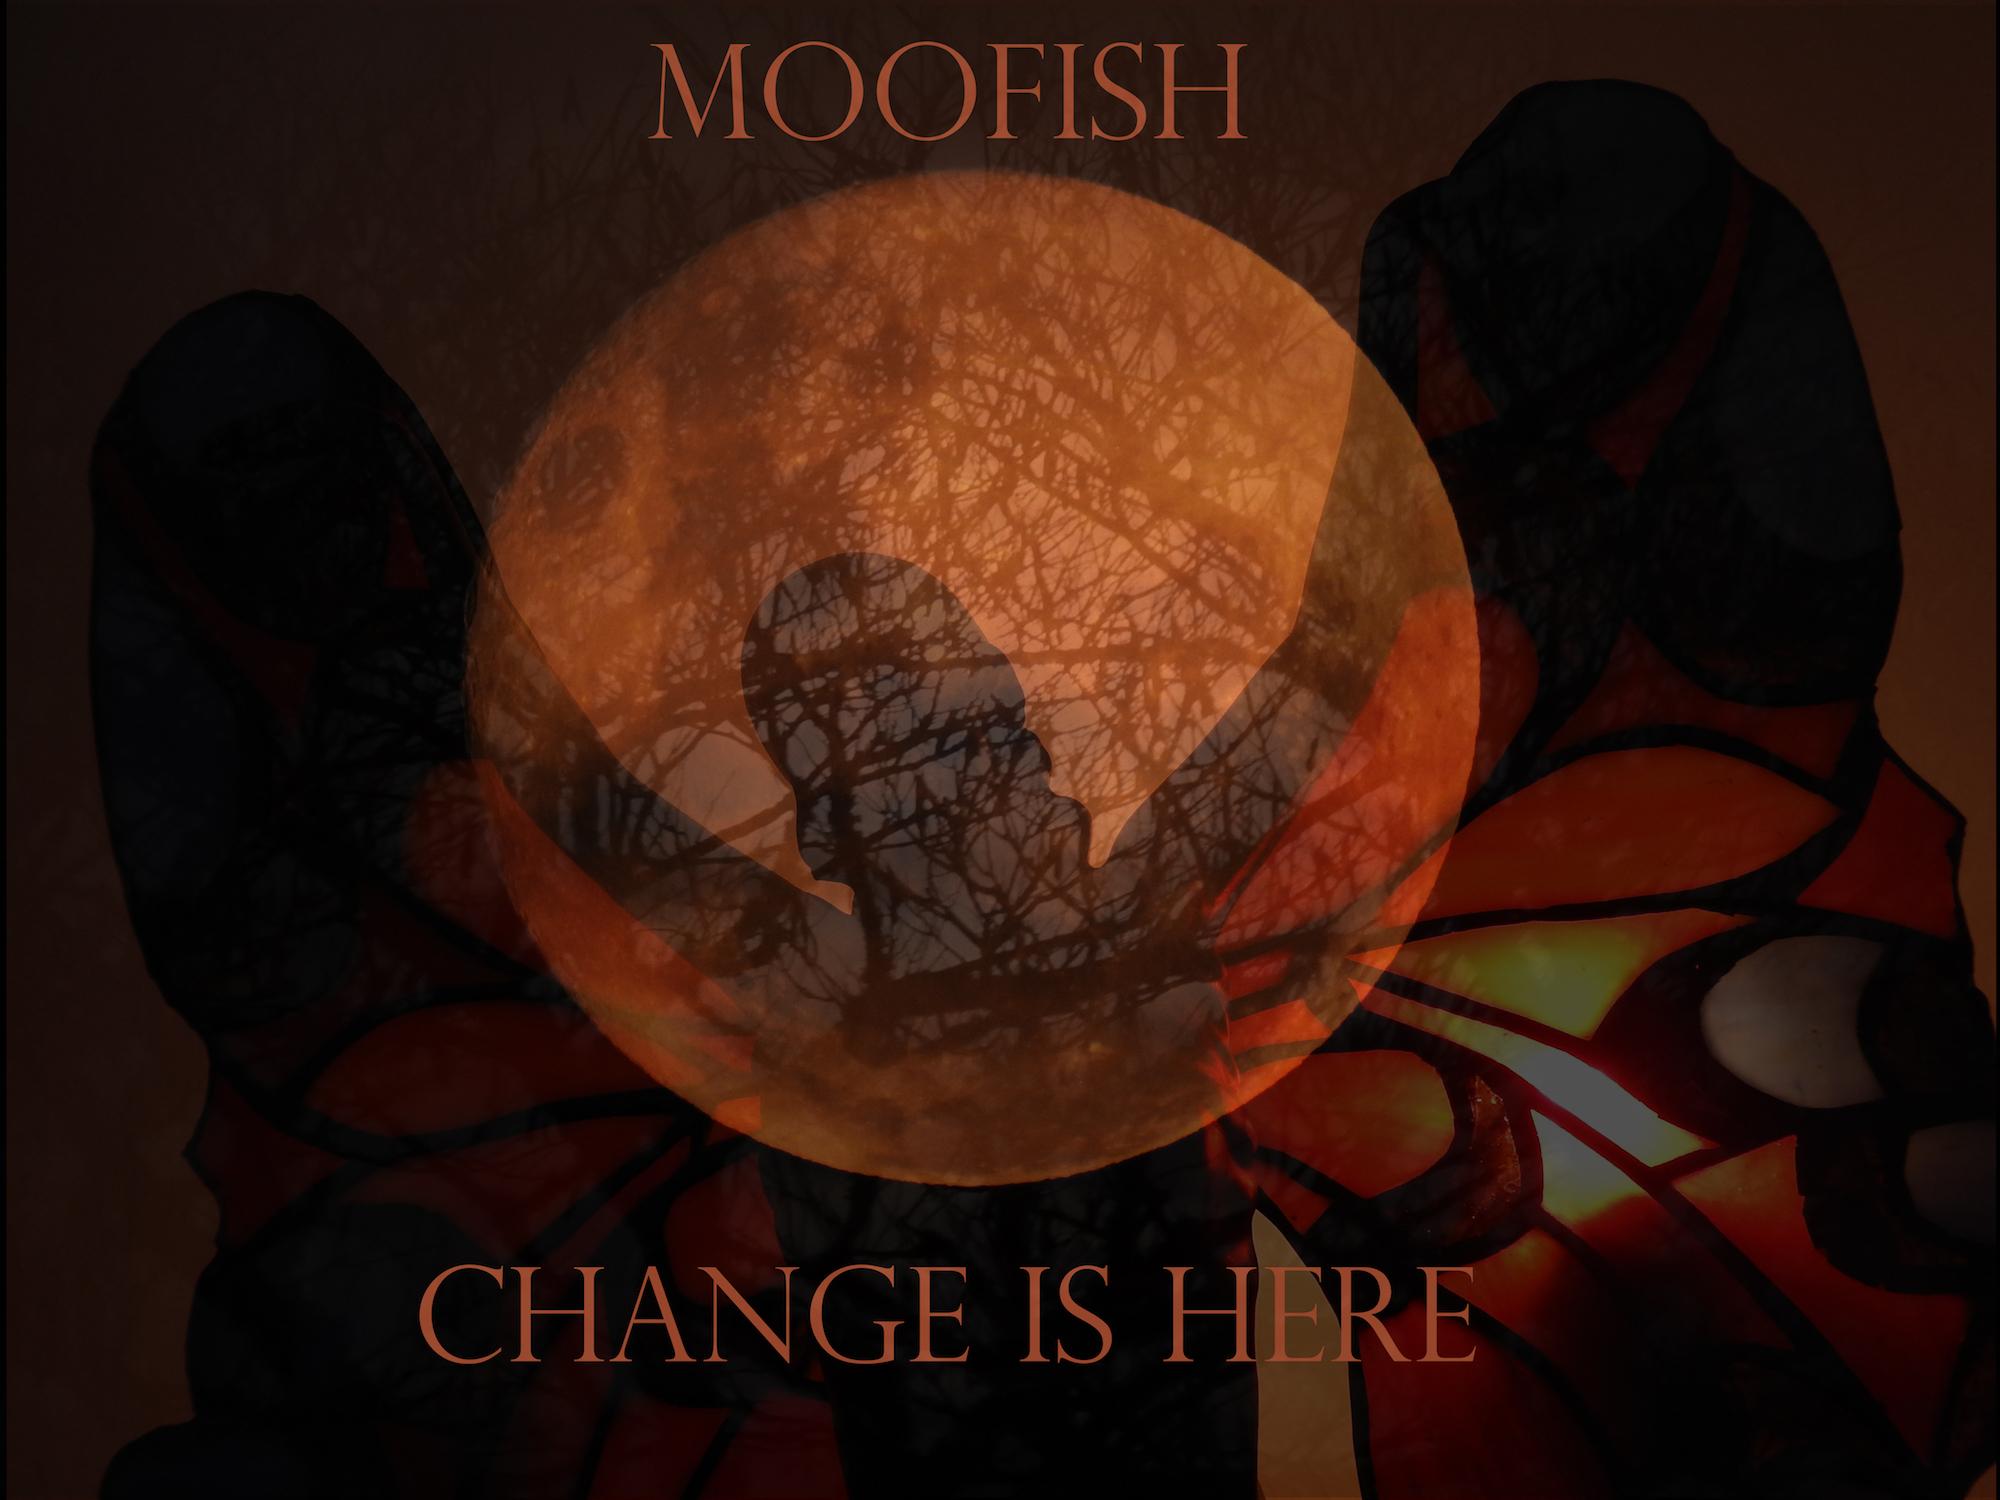 MooFish_AlbumCover_ChangeIsHere.jpg